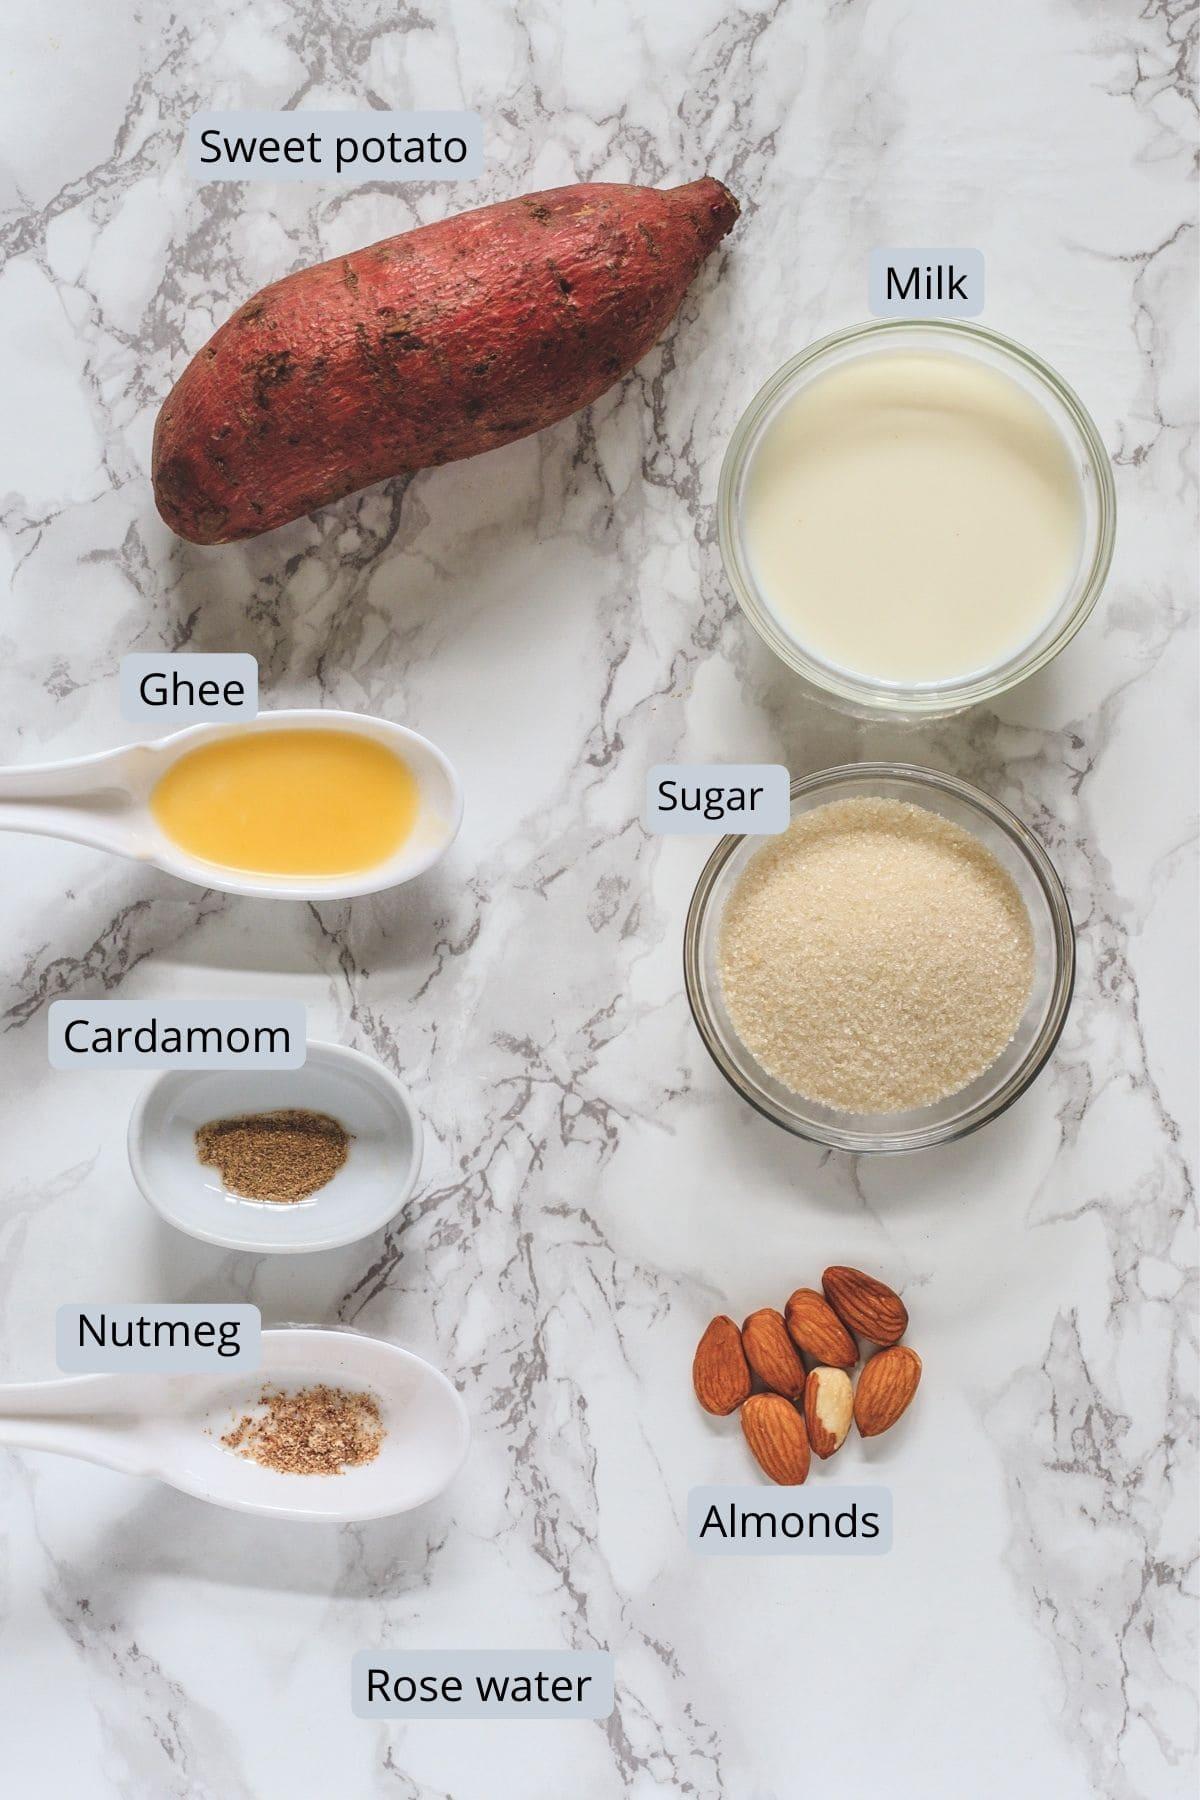 ingredients used in sweet potato halwa includes sweet potato, ghee, sugar, milk, almonds, cardamom, nutmeg